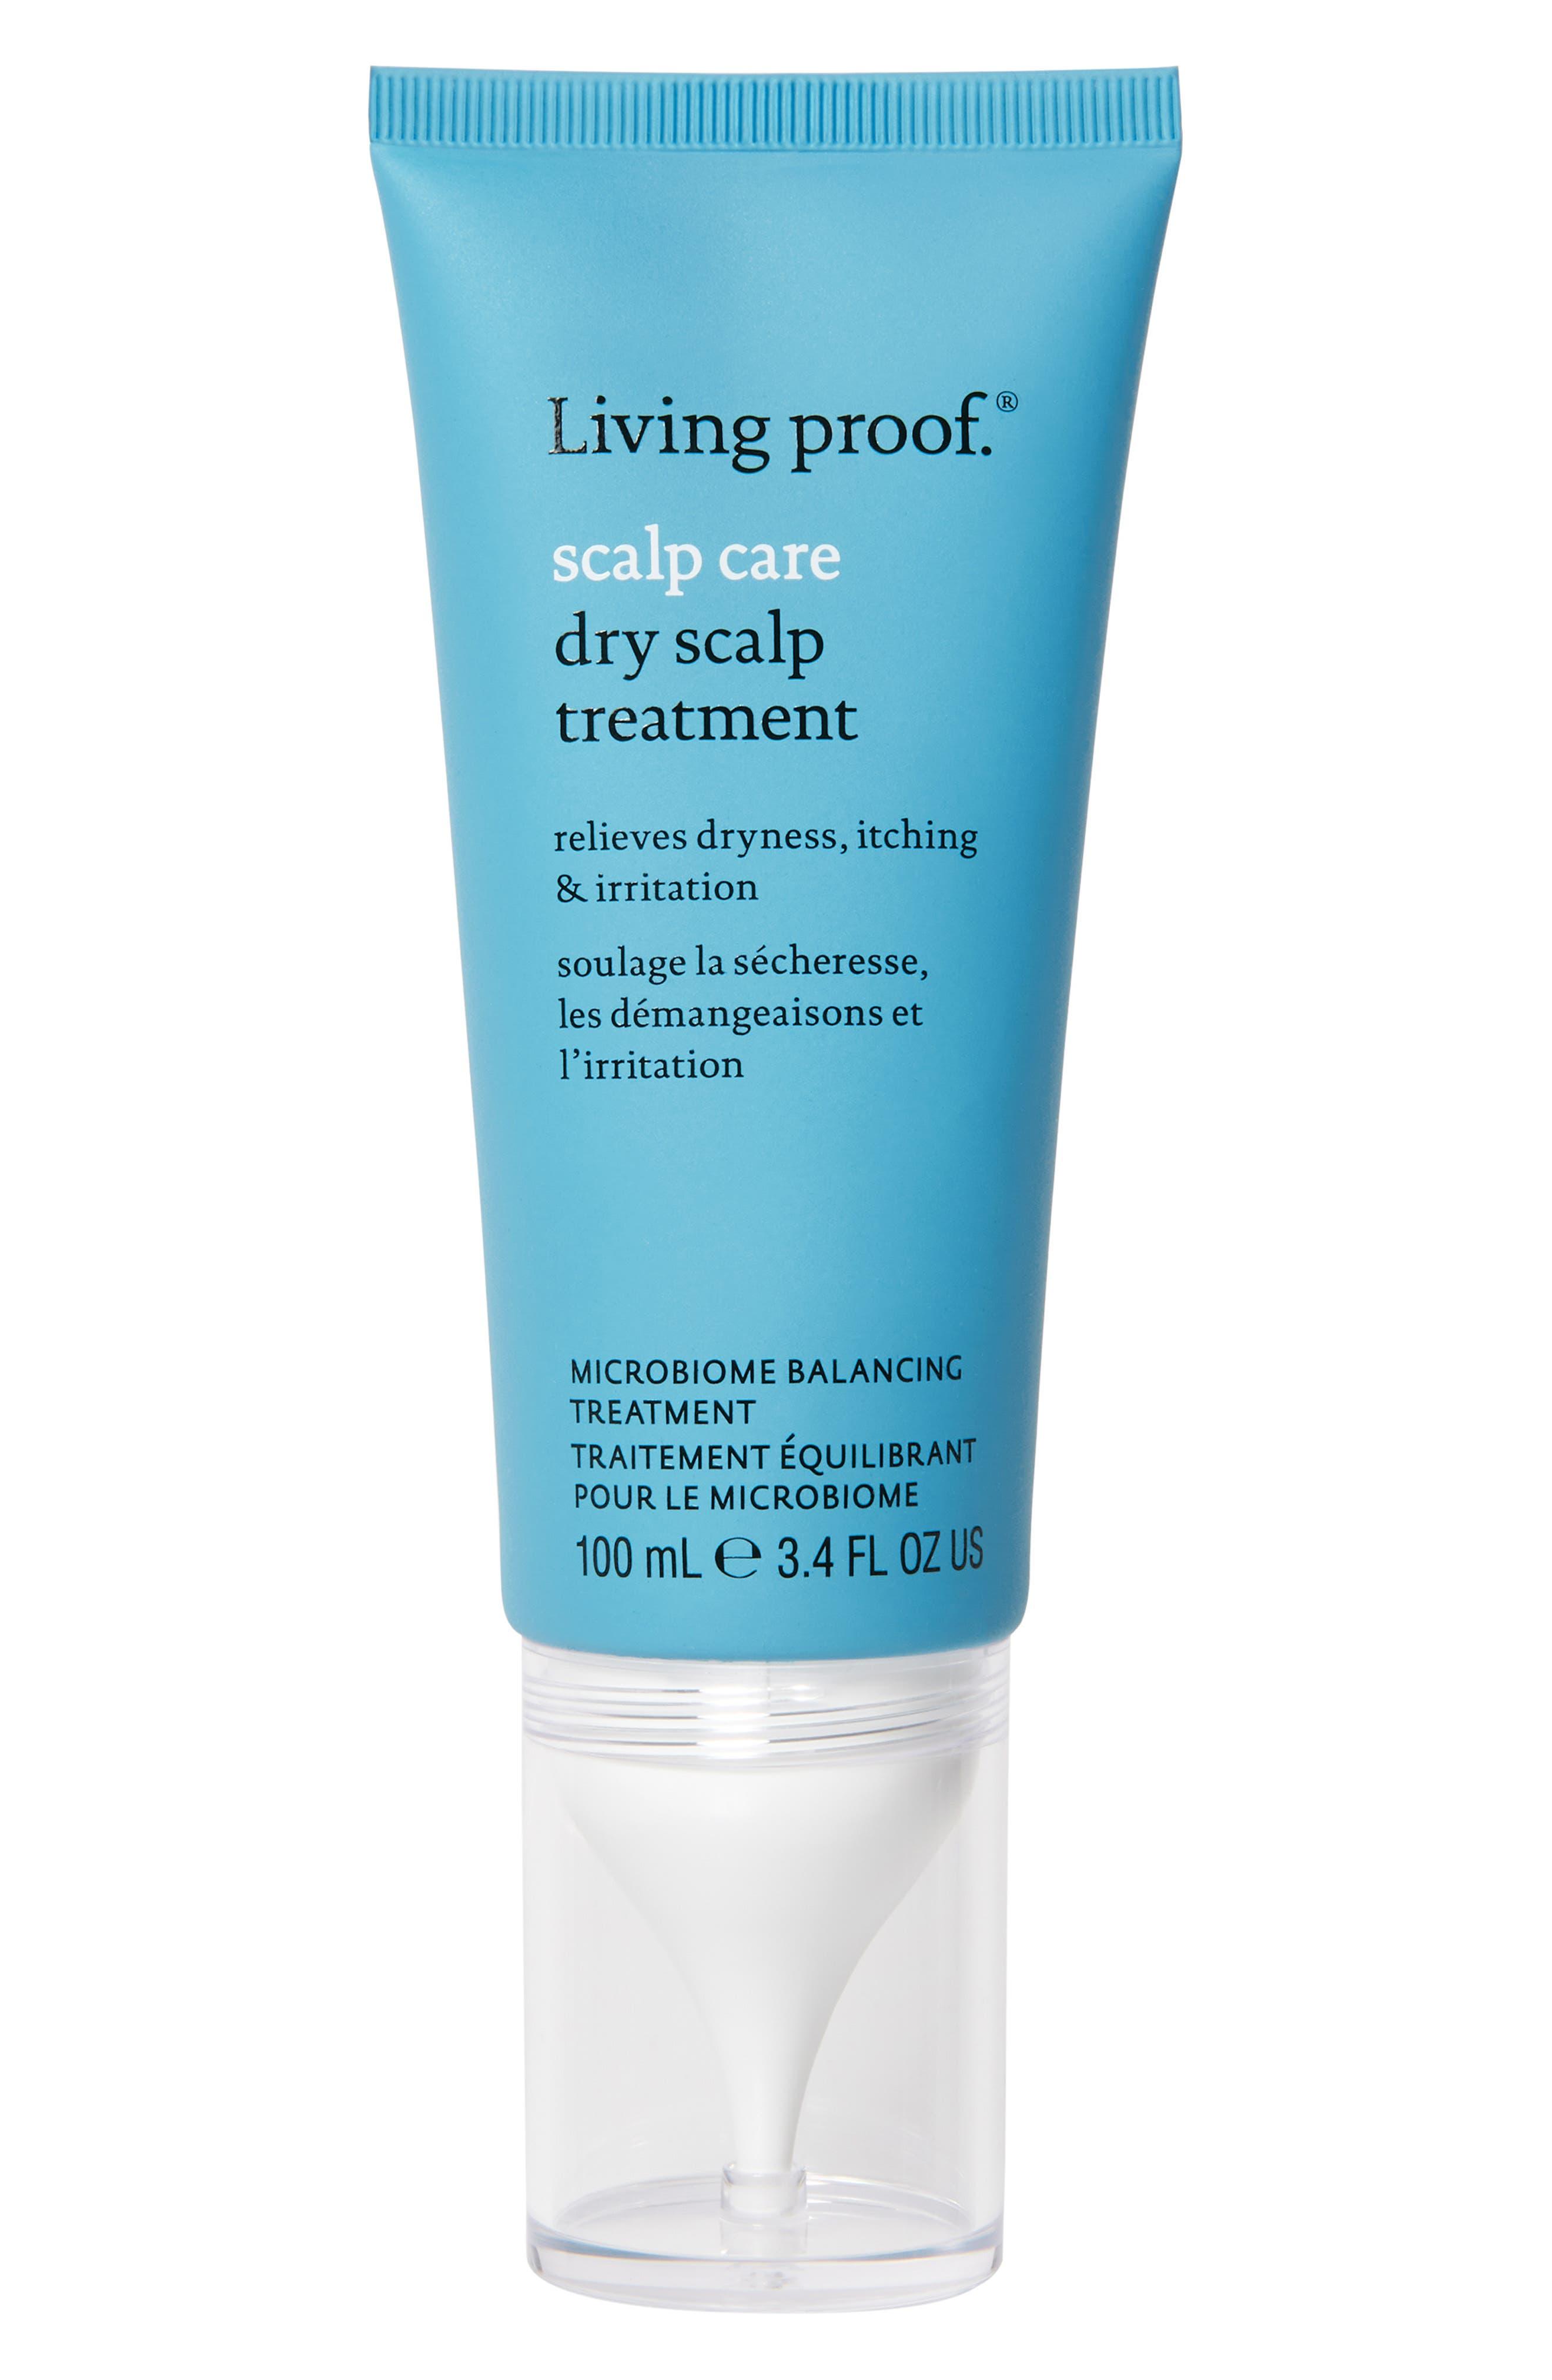 Living Proof Scalp Care Dry Scalp Treatment